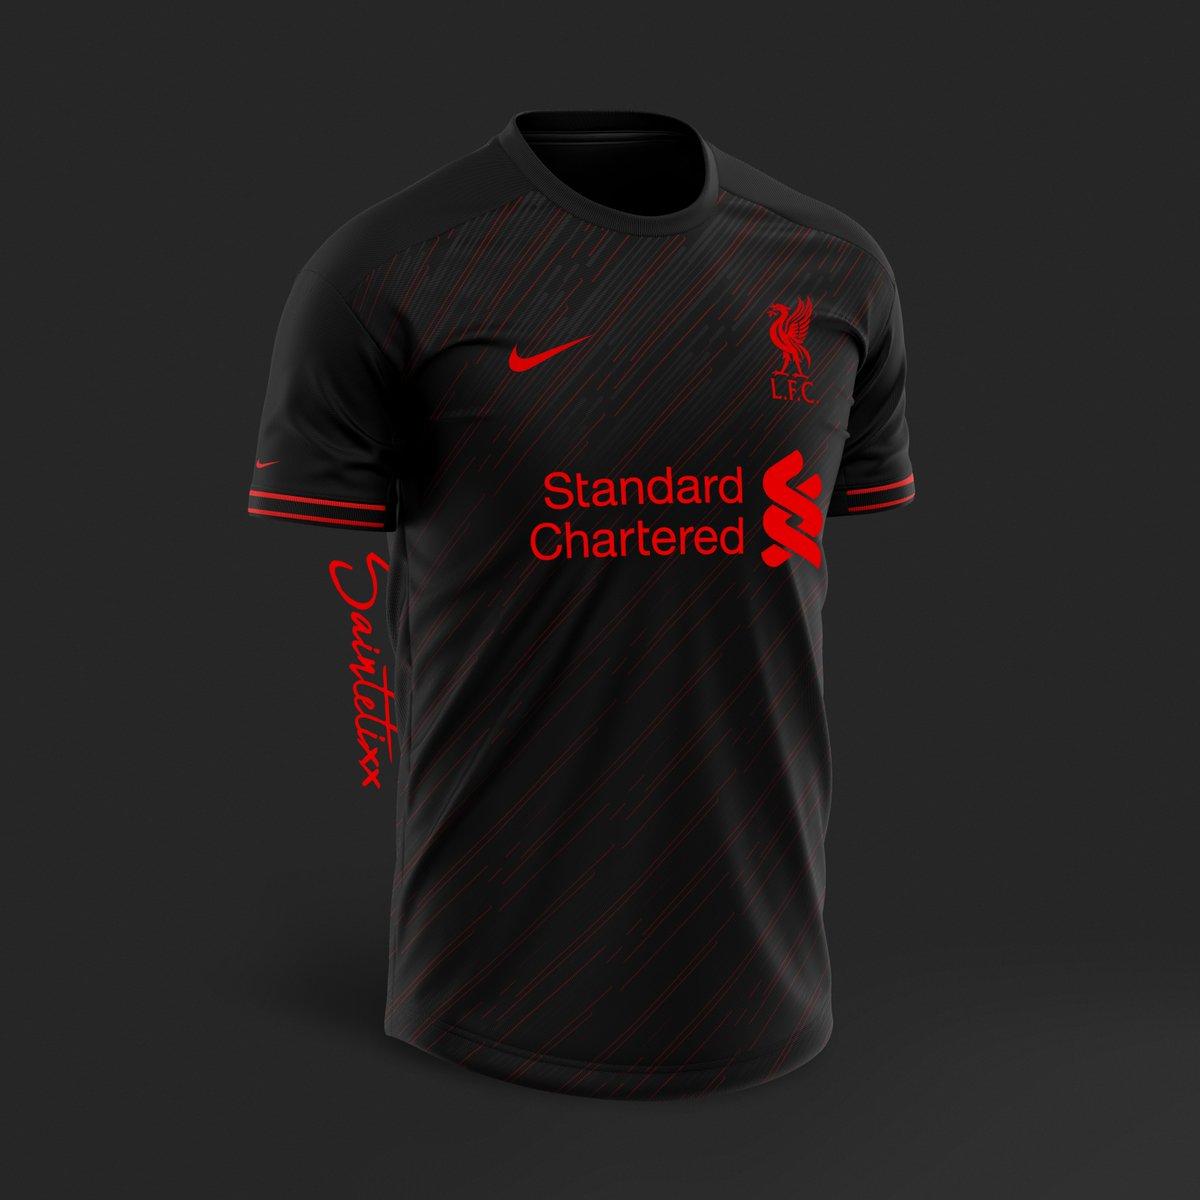 huge selection of 3b97b a3ee3 6 Nike Liverpool Konzepttrikots von Saintetixx - Nur Fussball